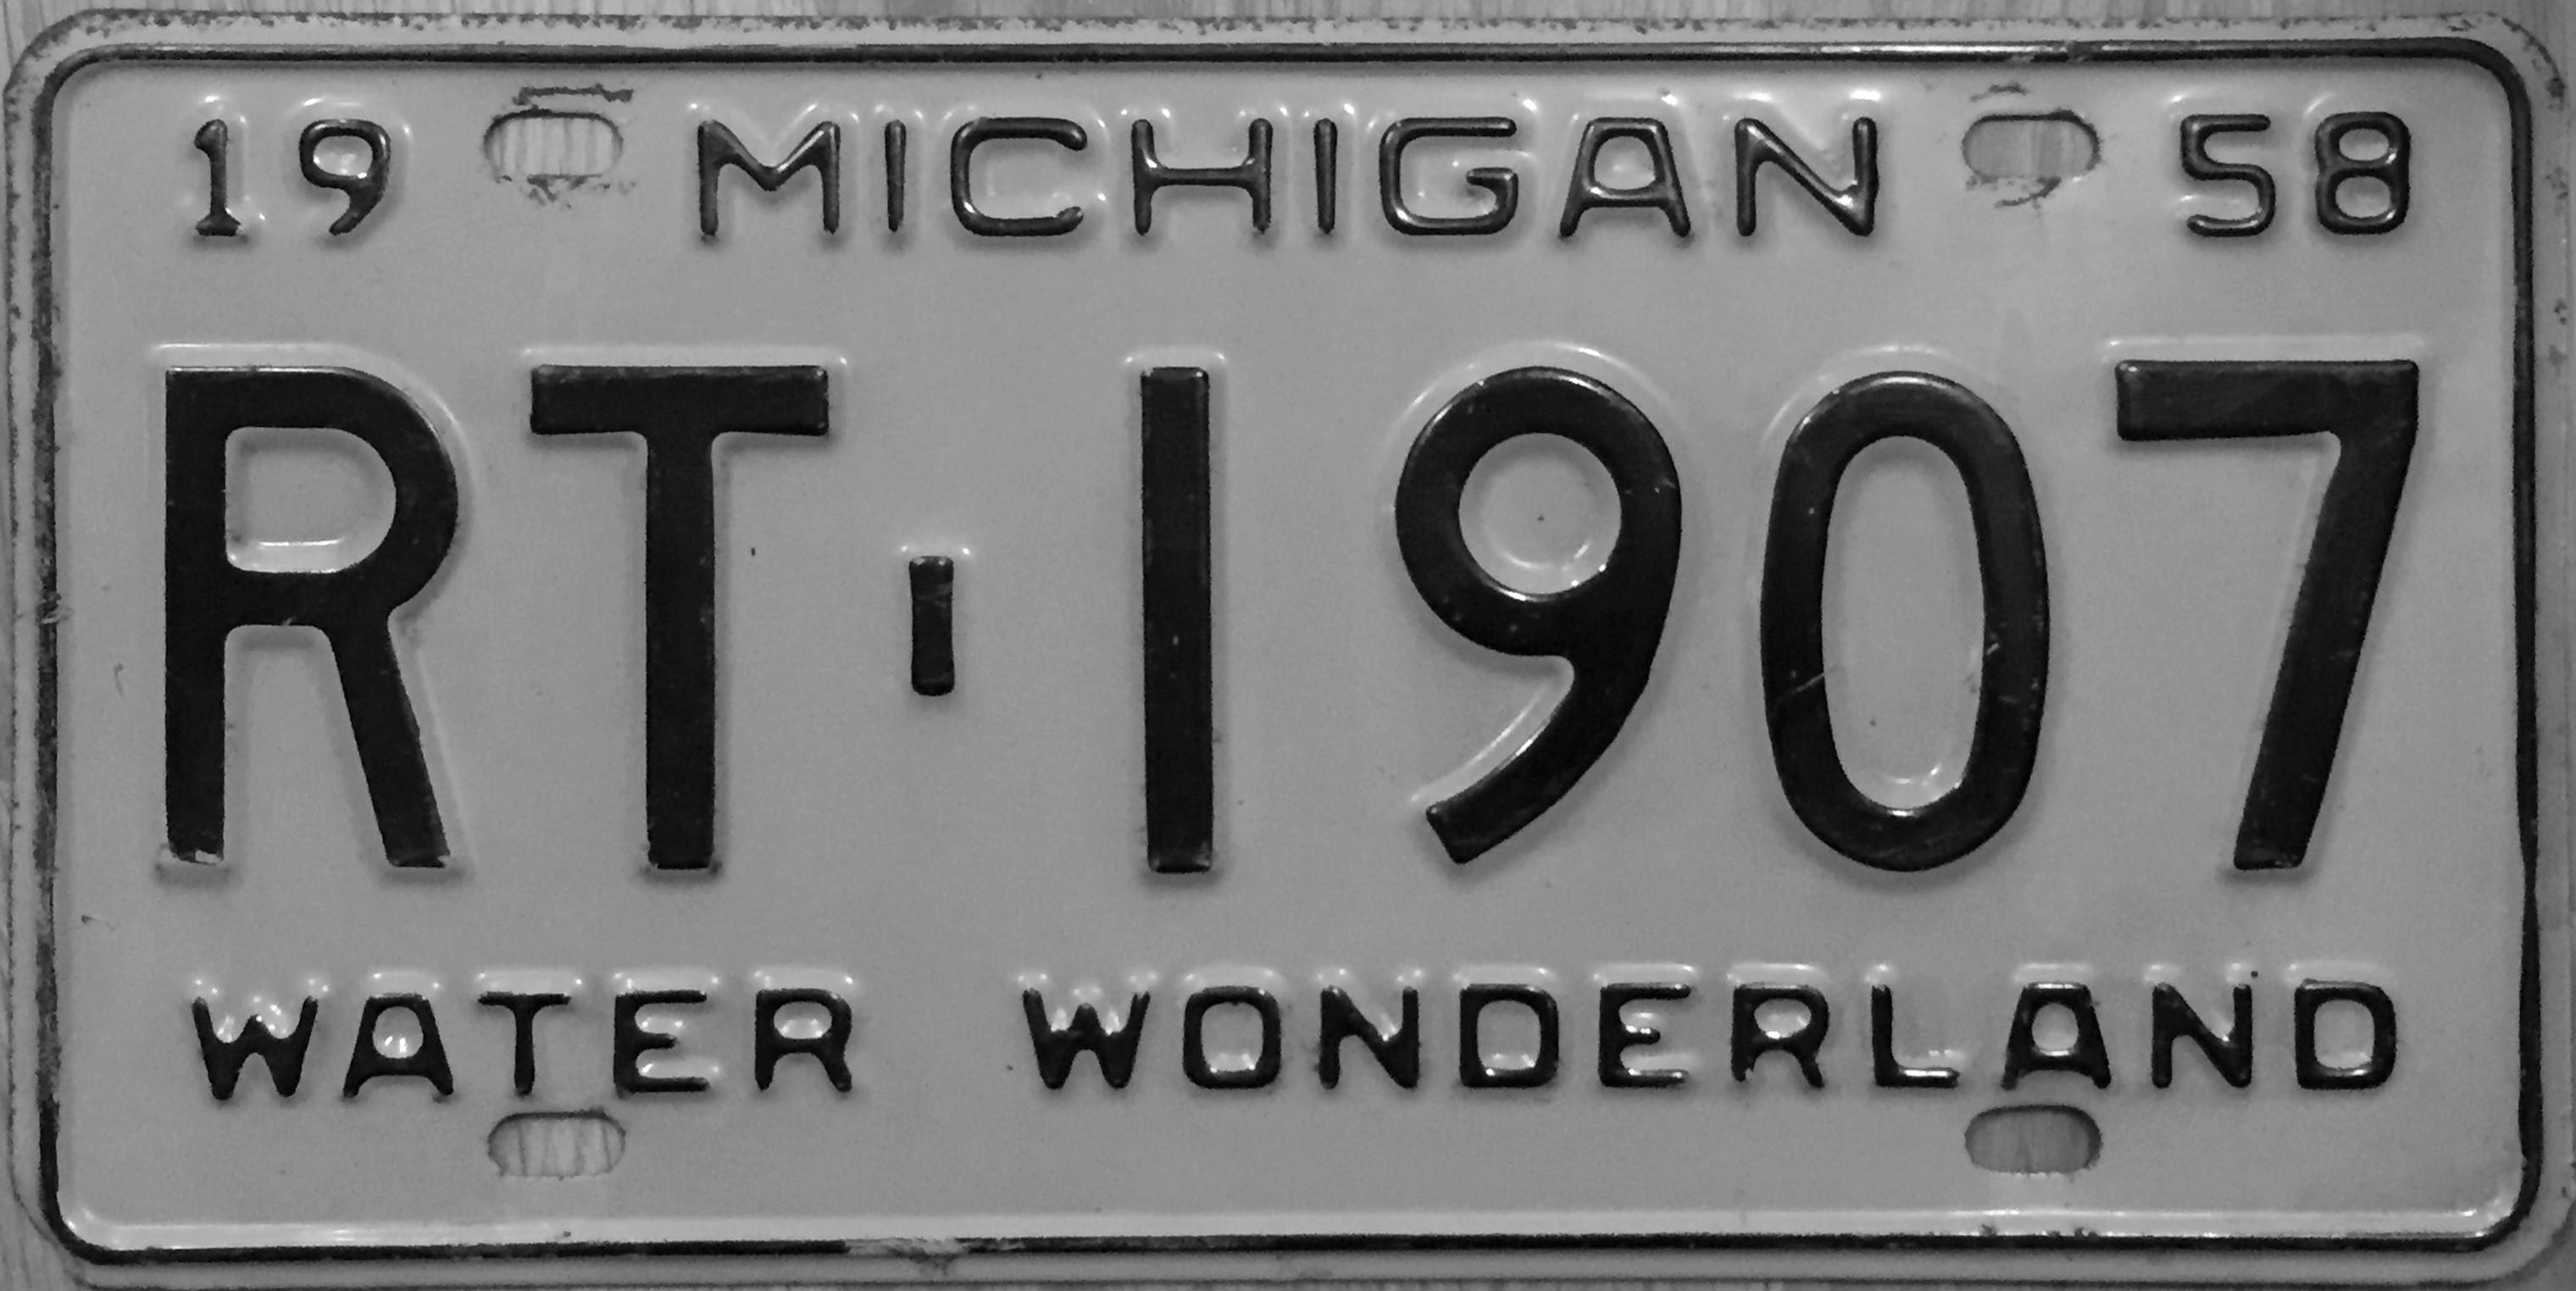 File:1958 Michigan License Plate.JPG - Wikimedia Commons